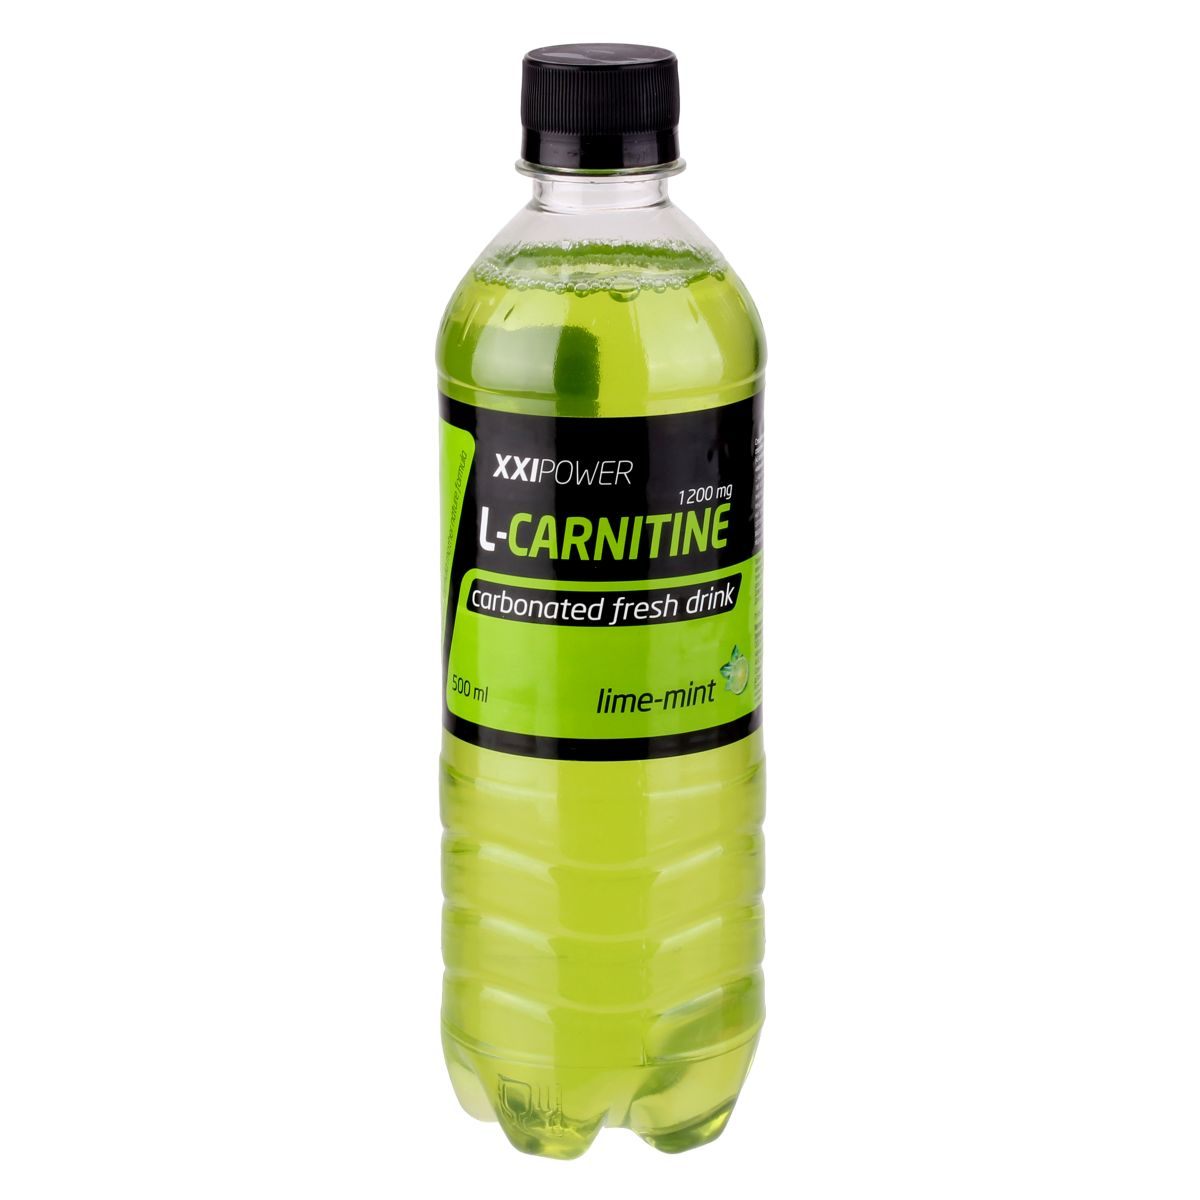 Напиток ХХI Power L-Carnitine, слабогазированный, лайм-мята, 0,5 л xxi power энергетический напиток xxi power гуарана 500мл